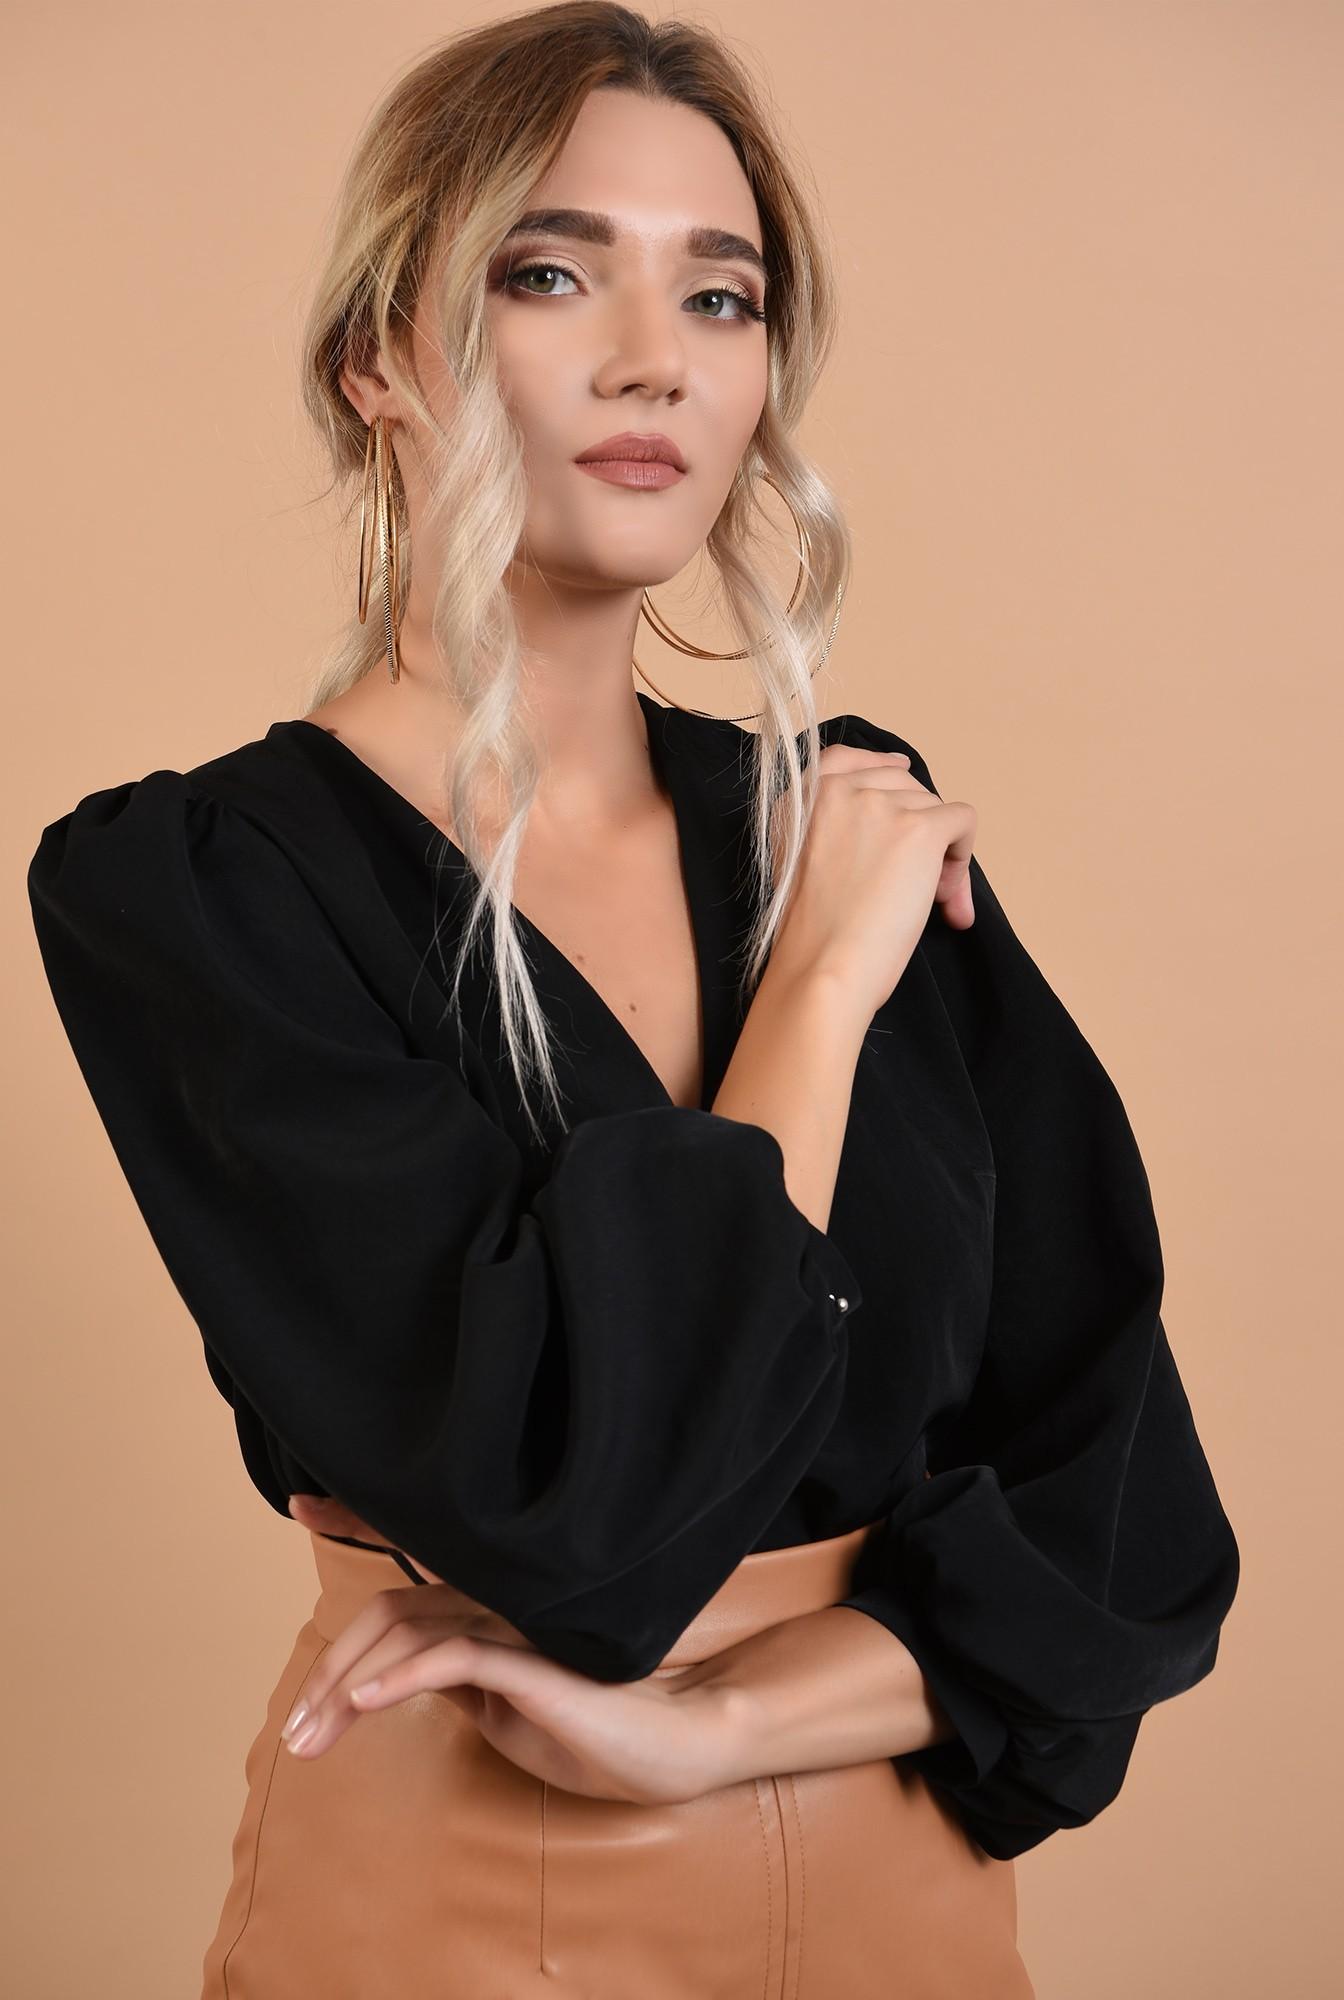 2 - bluza casual, neagra, cu decolteu in V, Poema